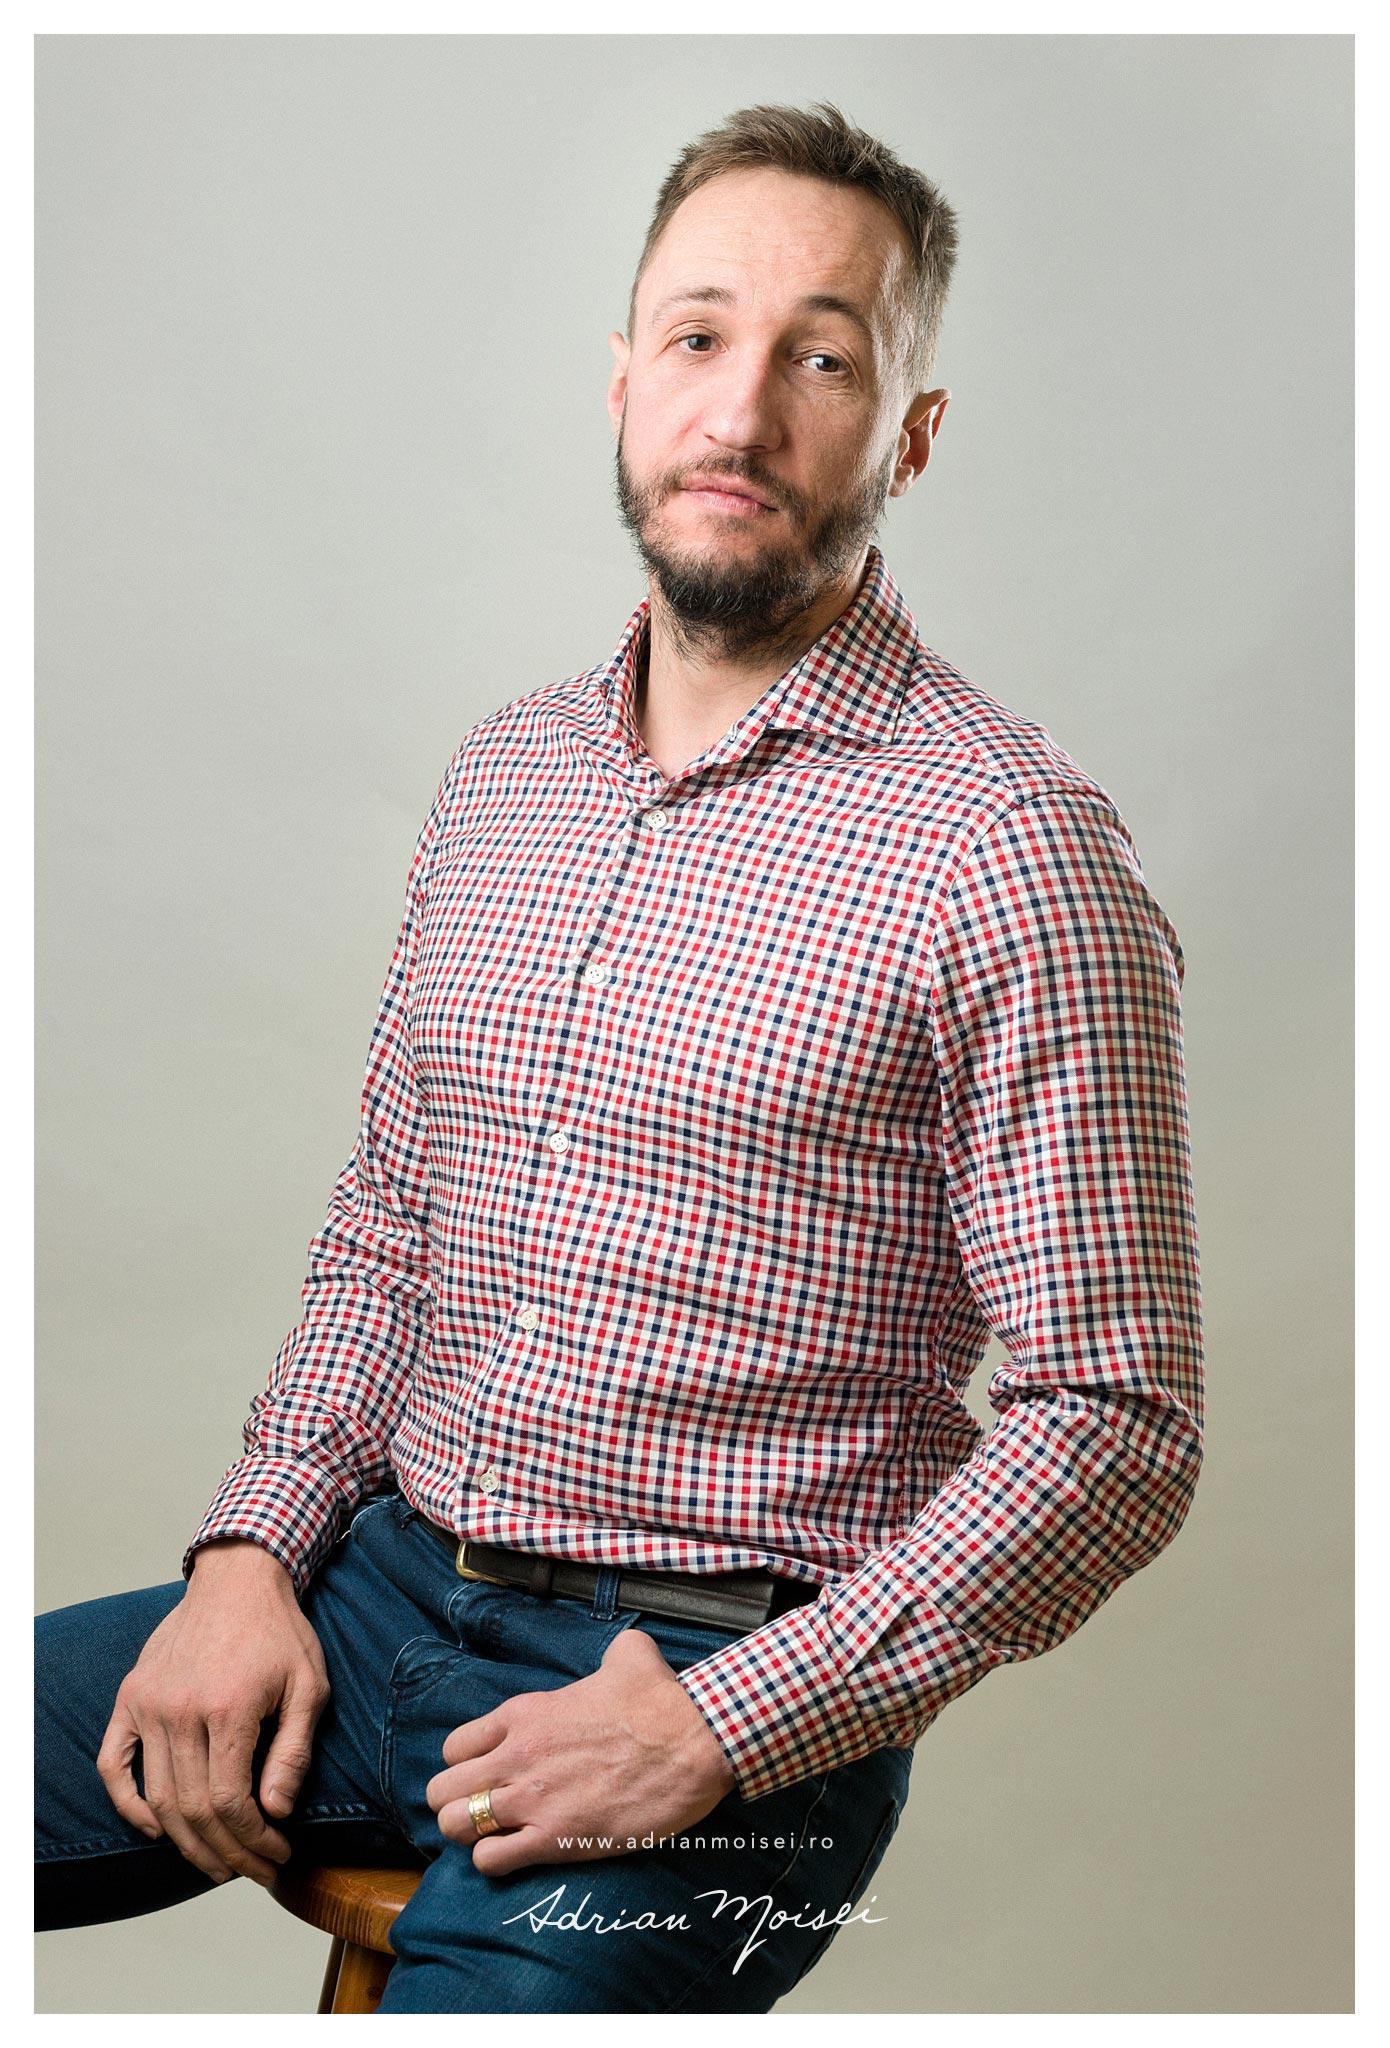 Fotograf corporate Iasi Adrian Moisei